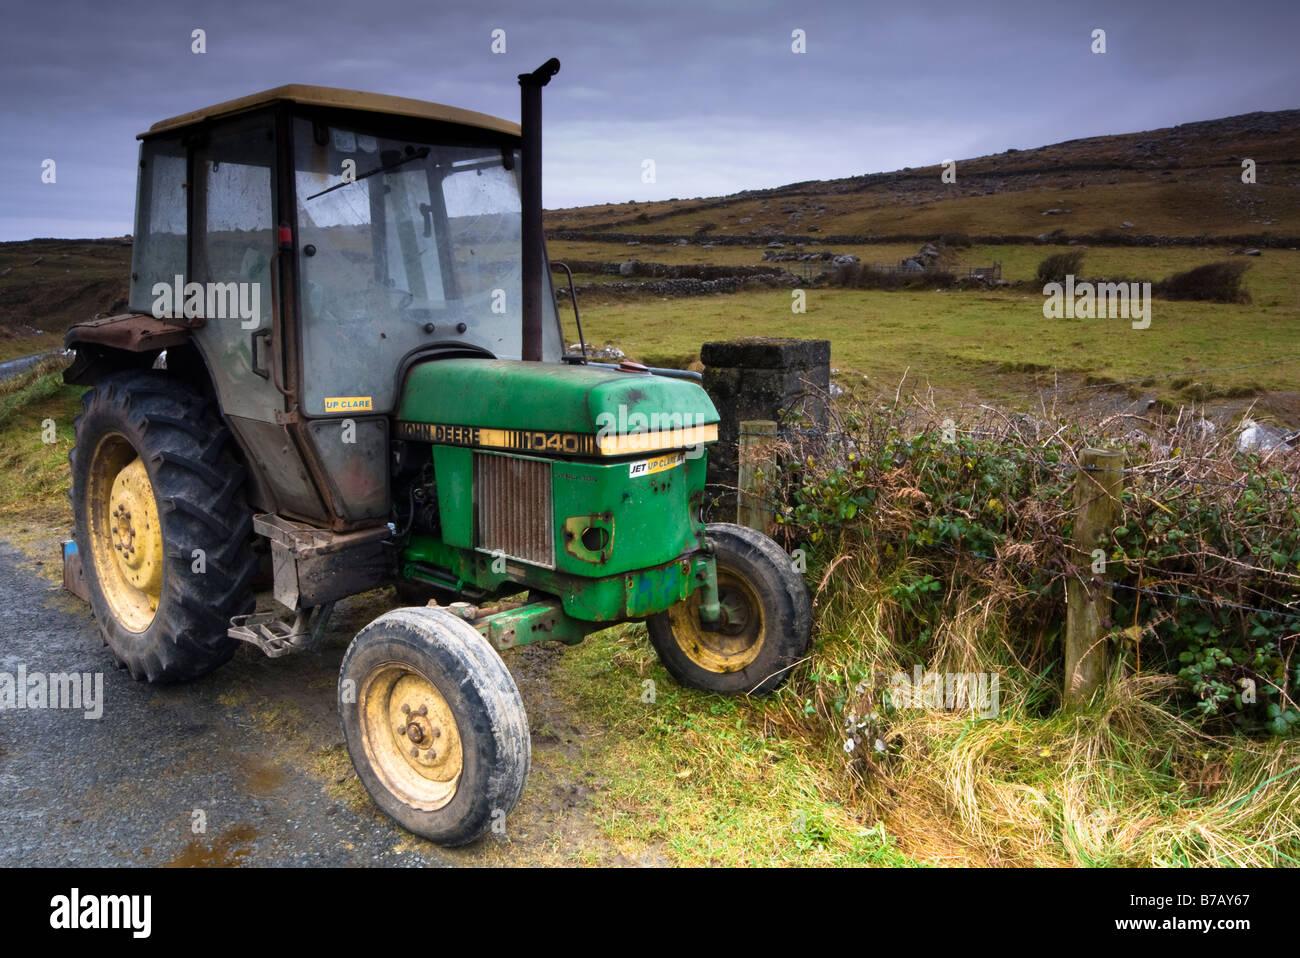 The Oldest John Deere : Old john deere tractor in fanore county clare